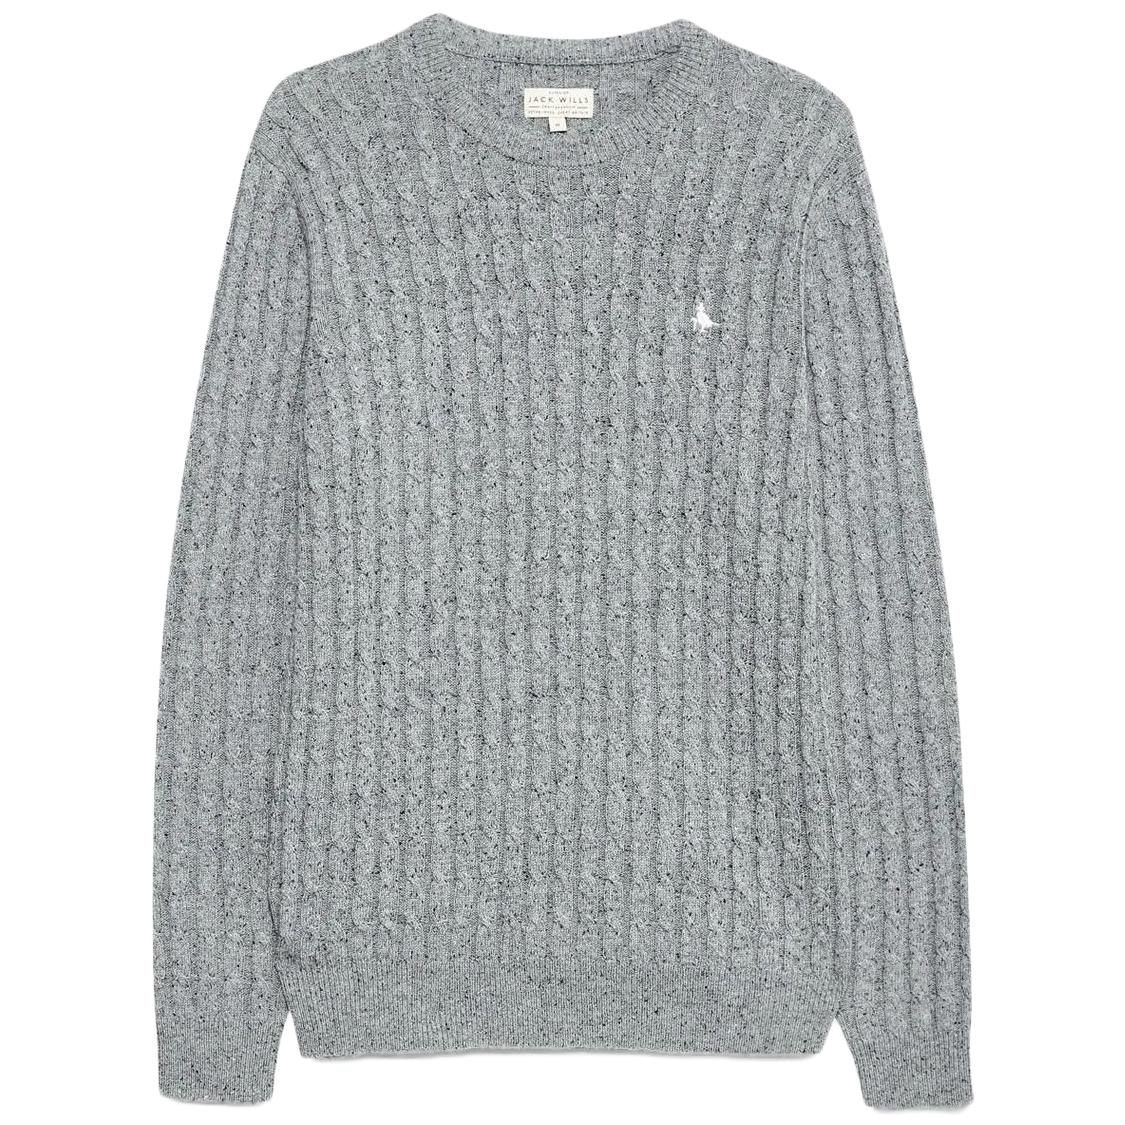 Jack Wills Men's Marlow Cable Knit Crewneck Sweater - Black, L